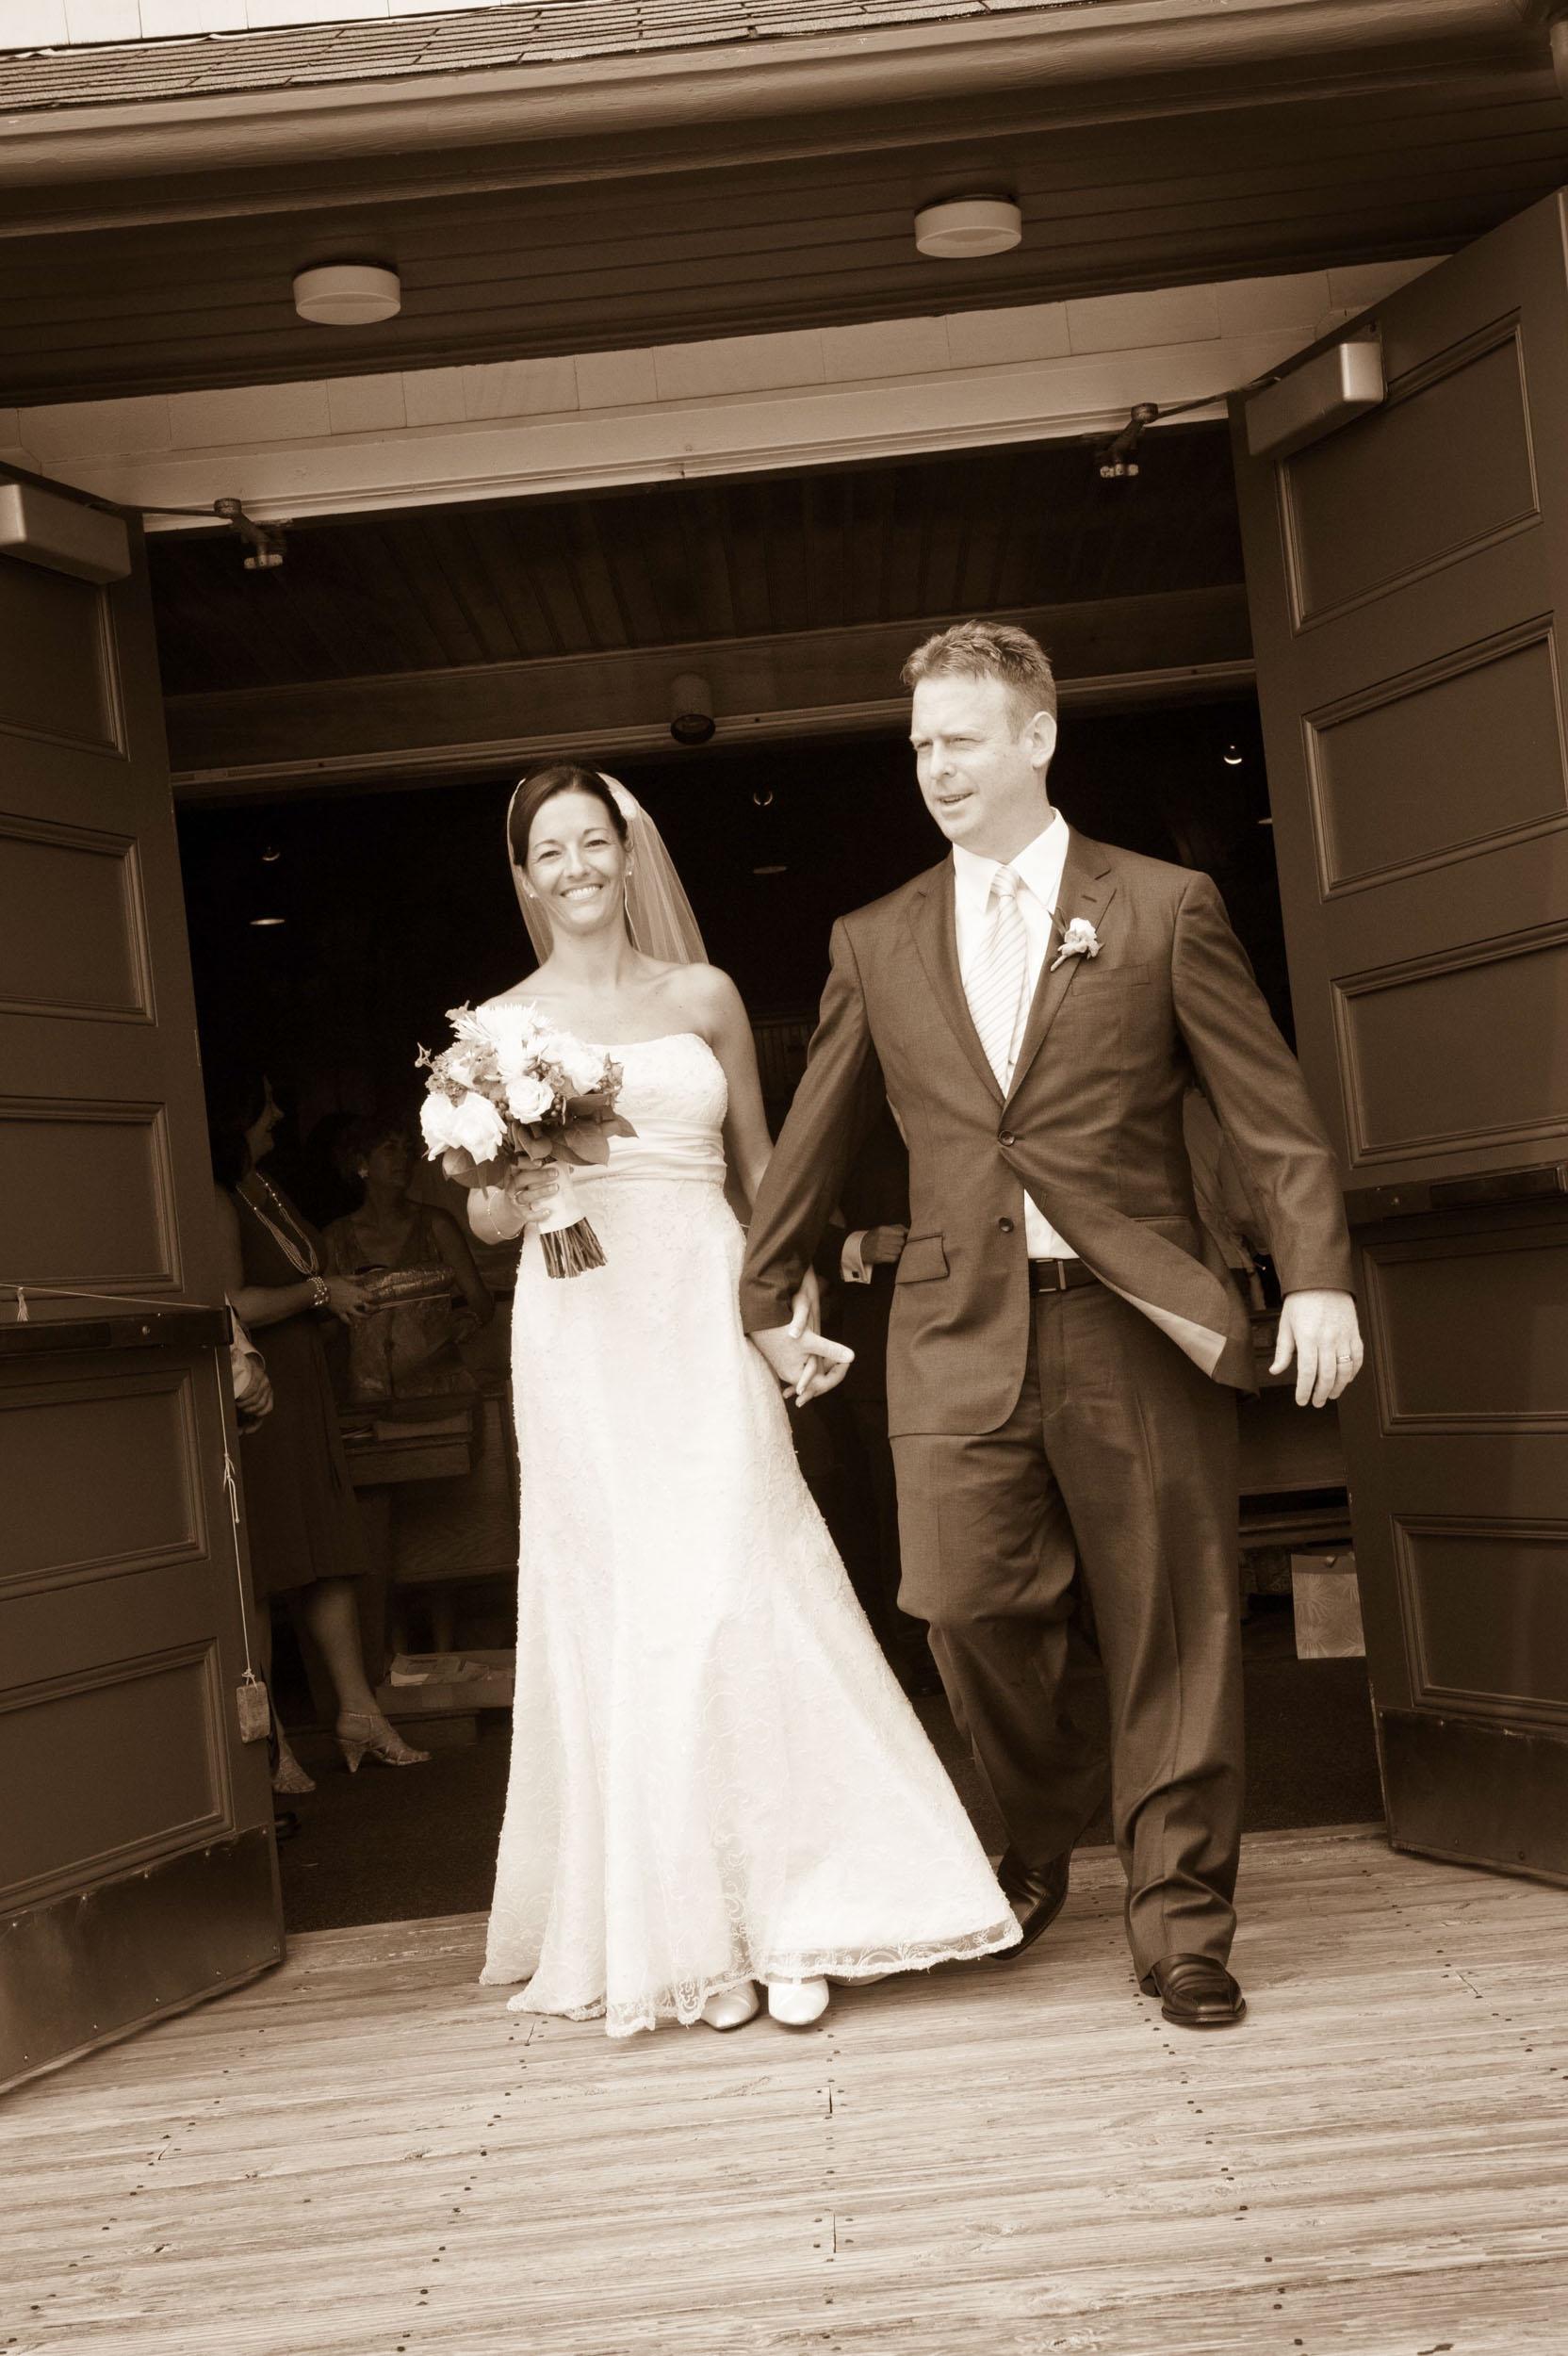 Wedding61k&J Block Island-101-2-2.jpg